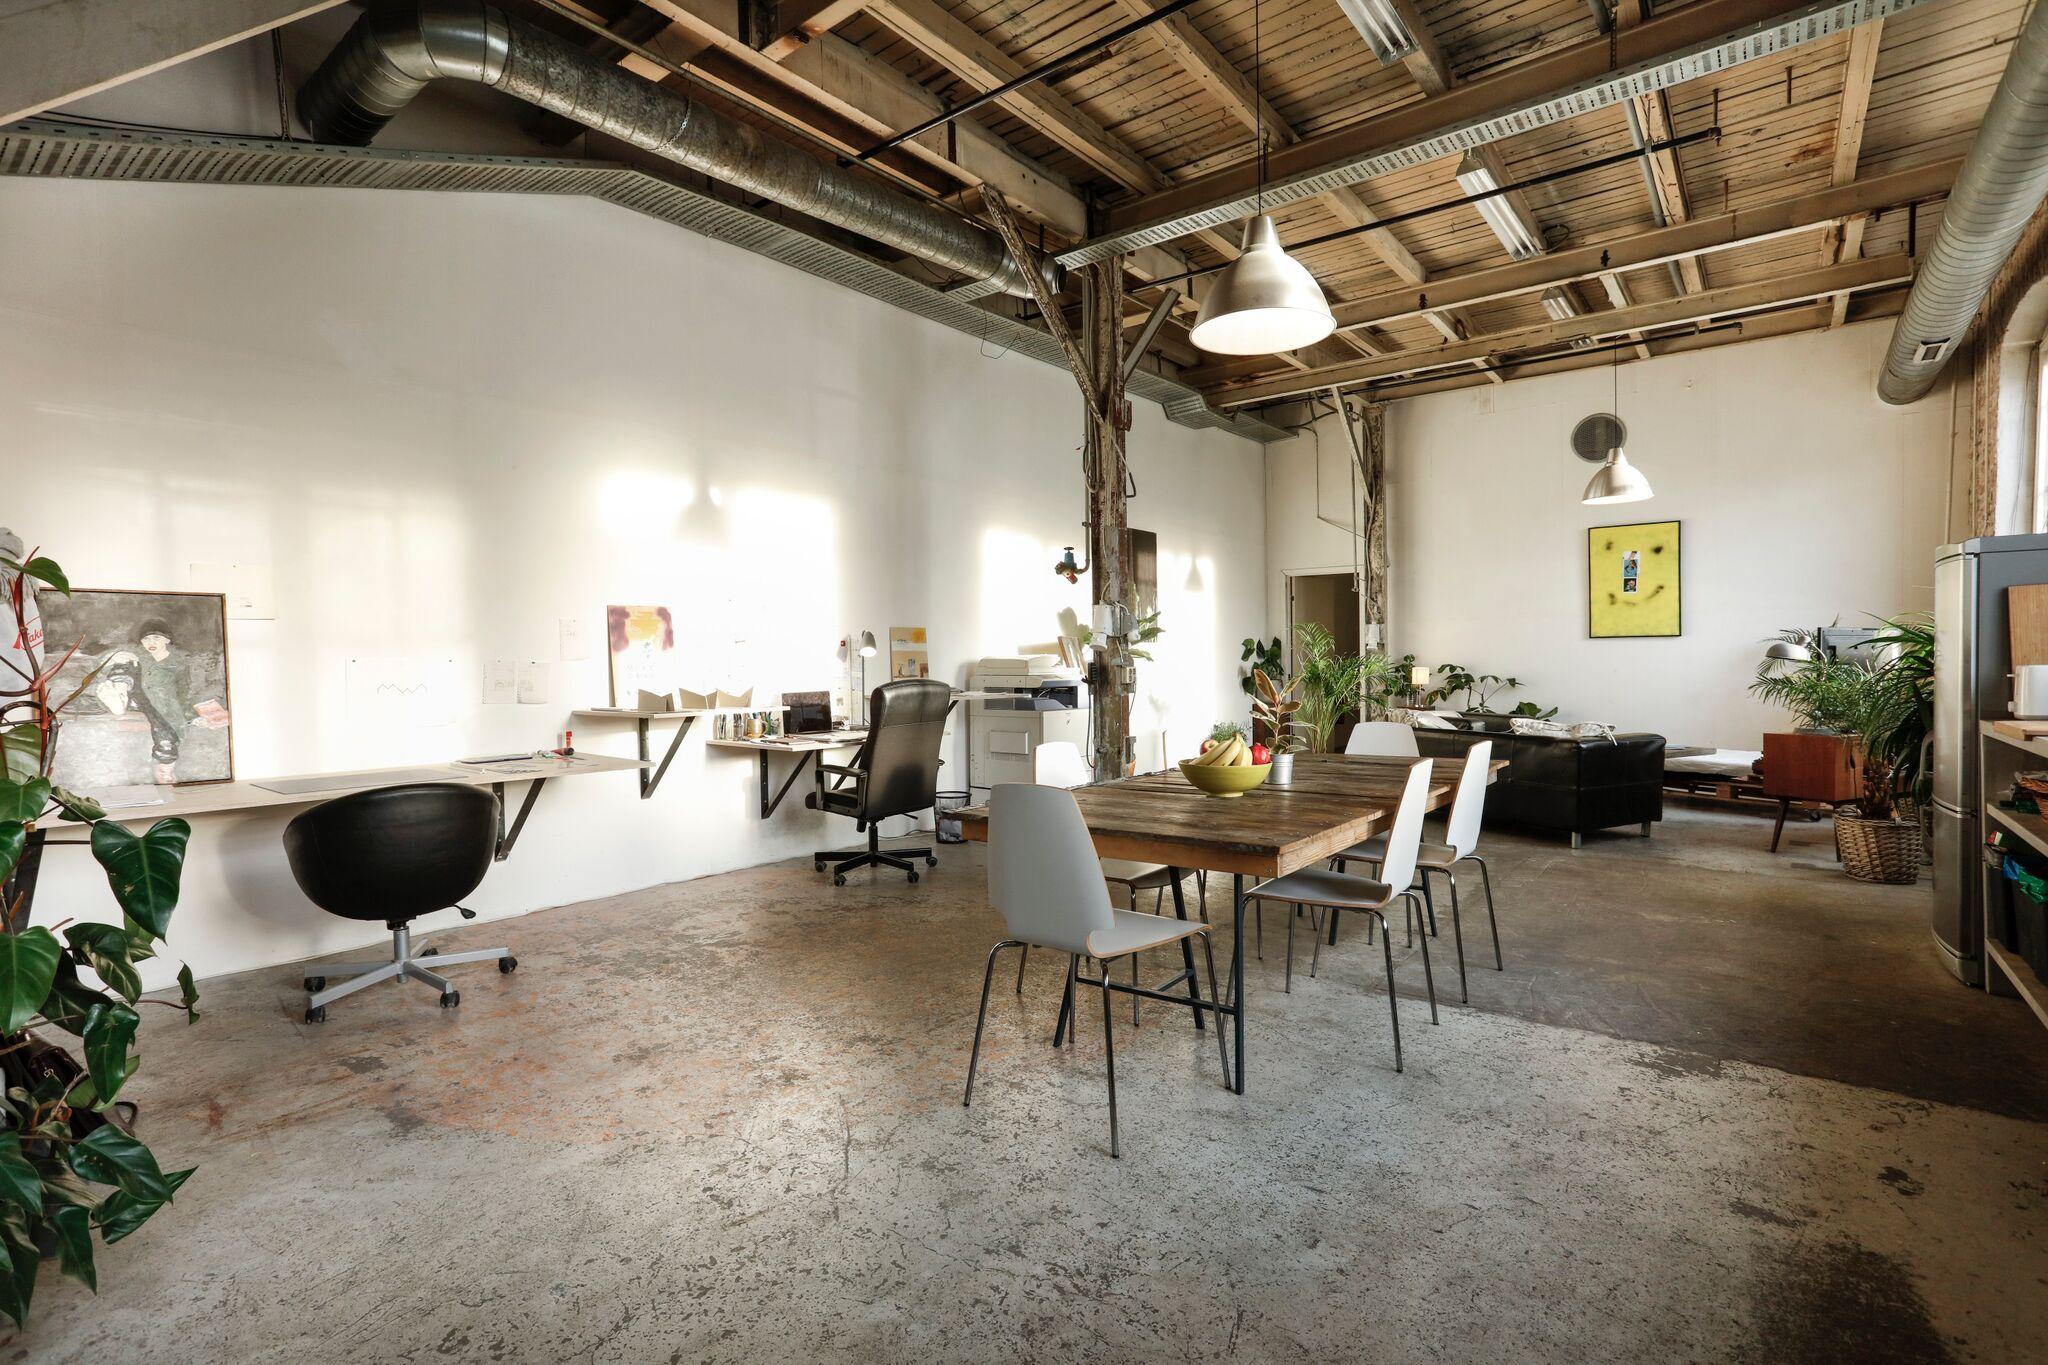 Studio til Mikkel Wennesland, Foto: Joachim Karlsen